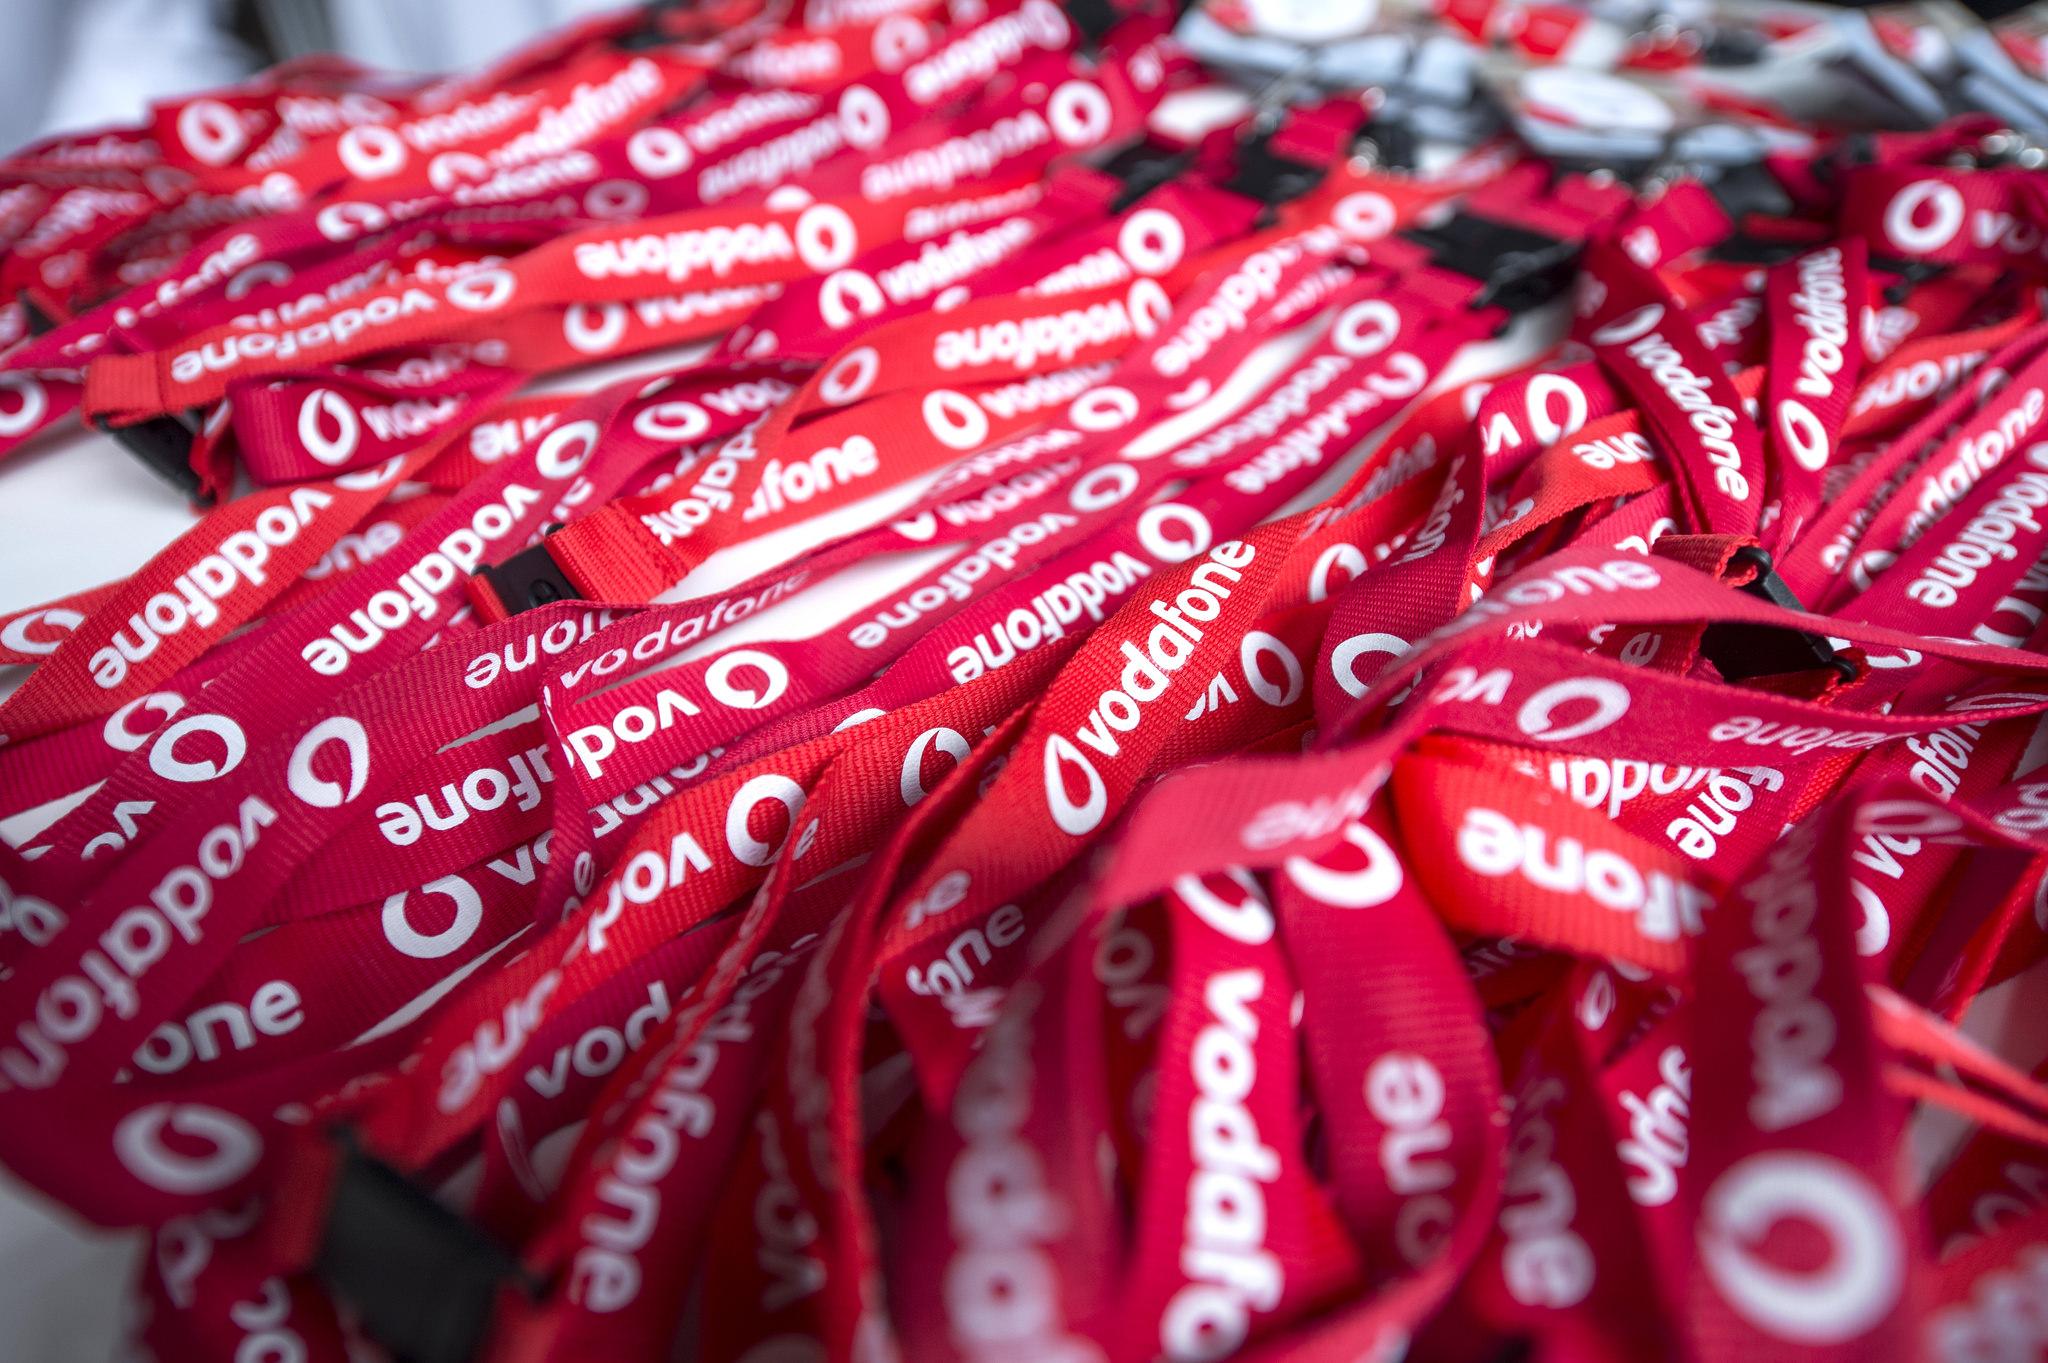 С 5 мая тарифы Vodafone Red 2015 подорожают в среднем на 40% (исправлено)